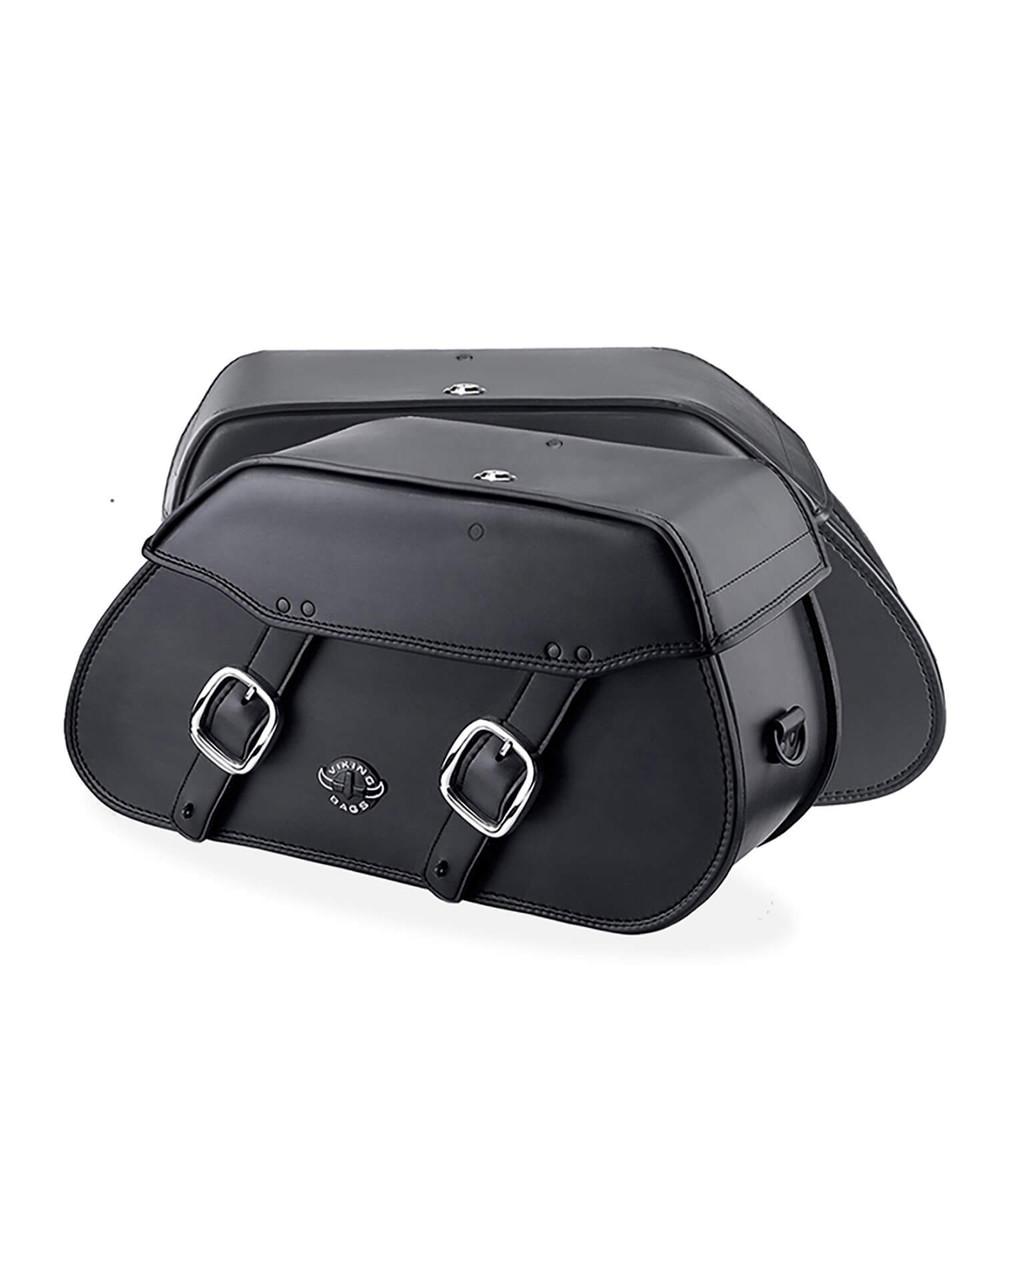 Yamaha Startoliner XV 1900 Pinnacle Motorcycle Saddlebags Both Bags View